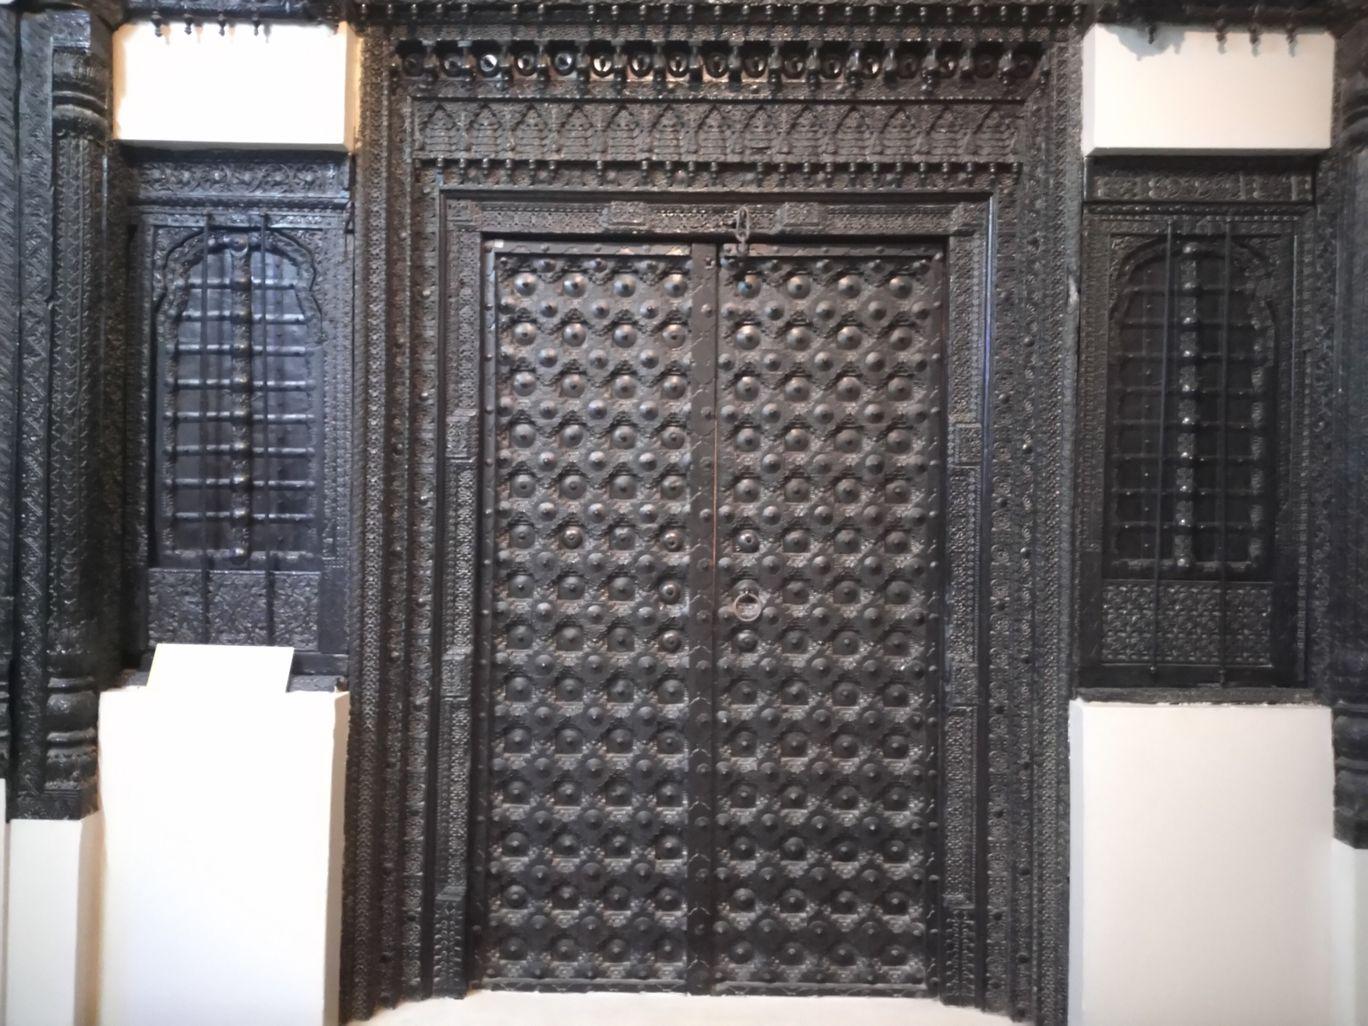 Photo of Raja Dinkar Kelkar Museum By Chaithra Shettigar